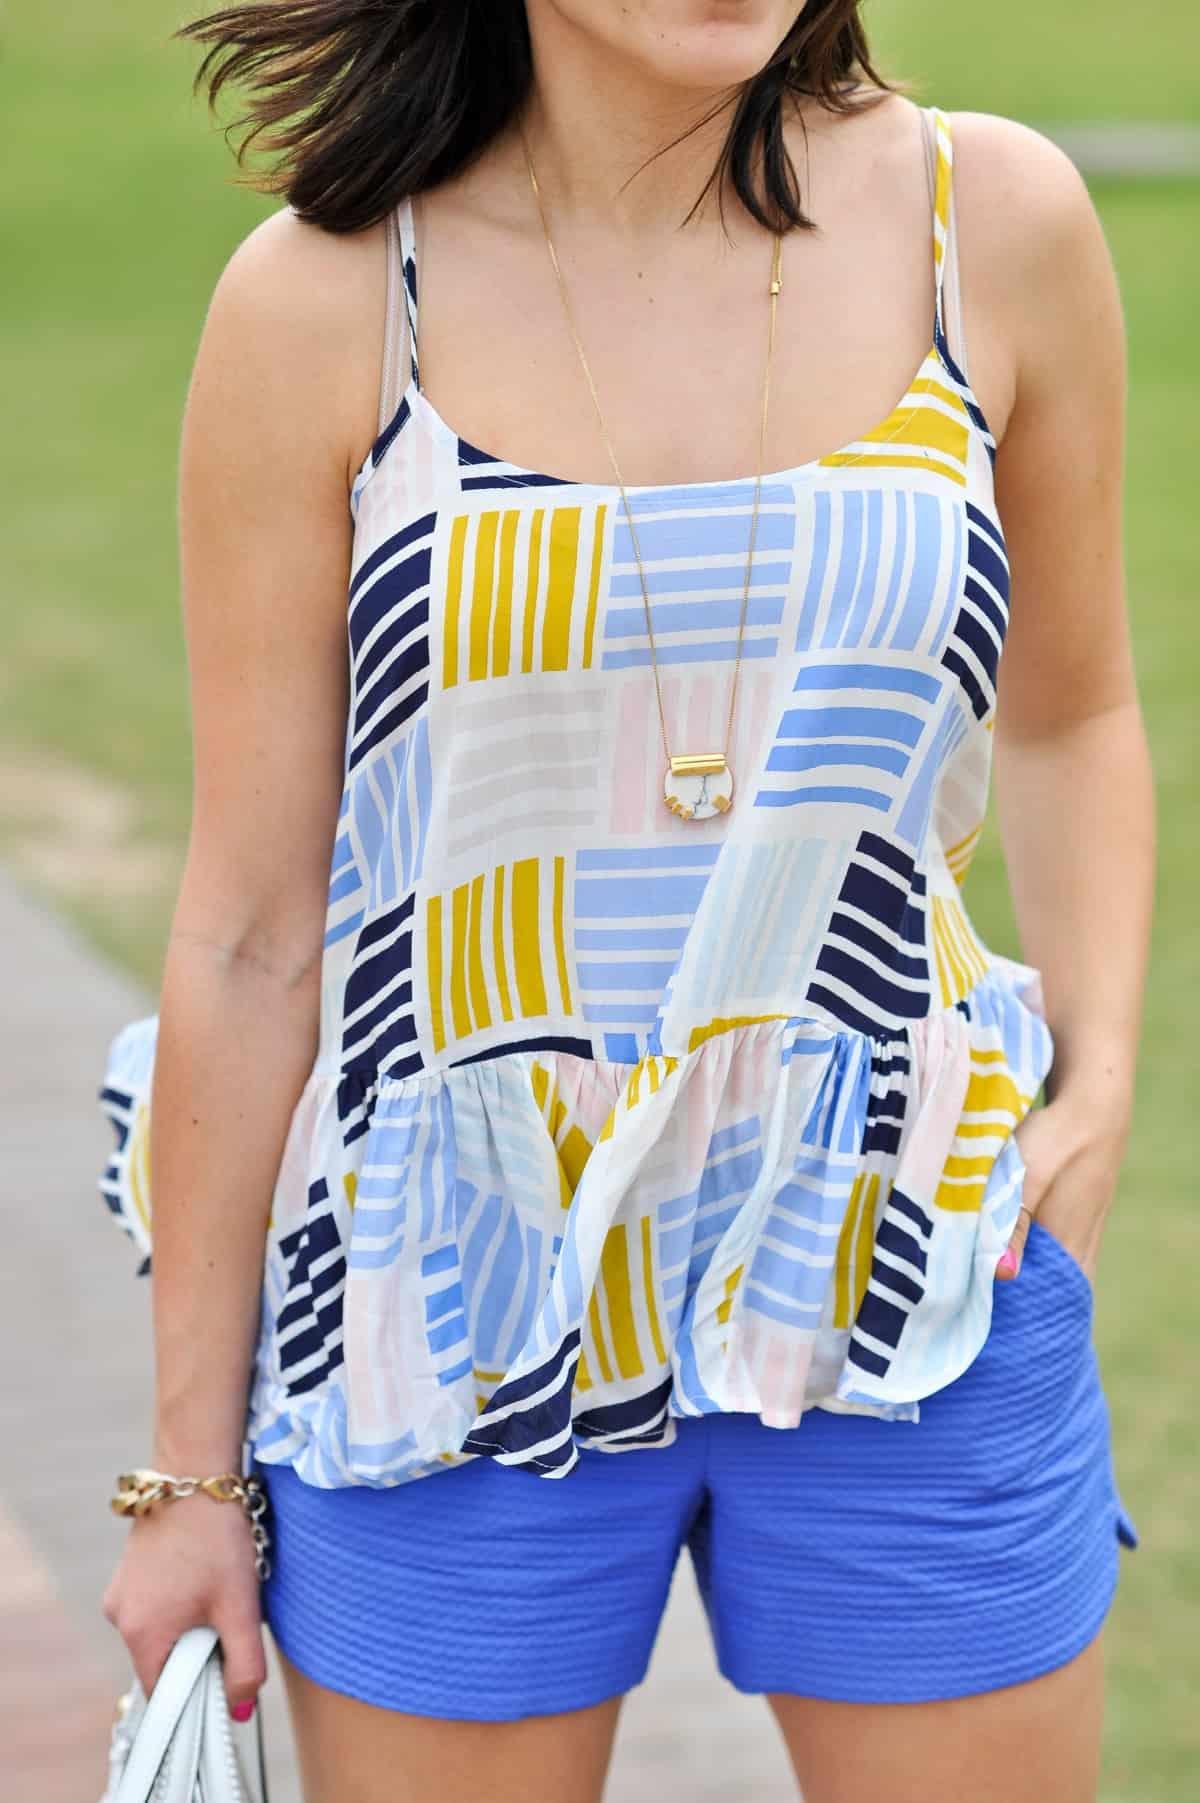 Old Navy printed peplum tank - summer outfit ideas - My Style Vita - @mystylevita - 12